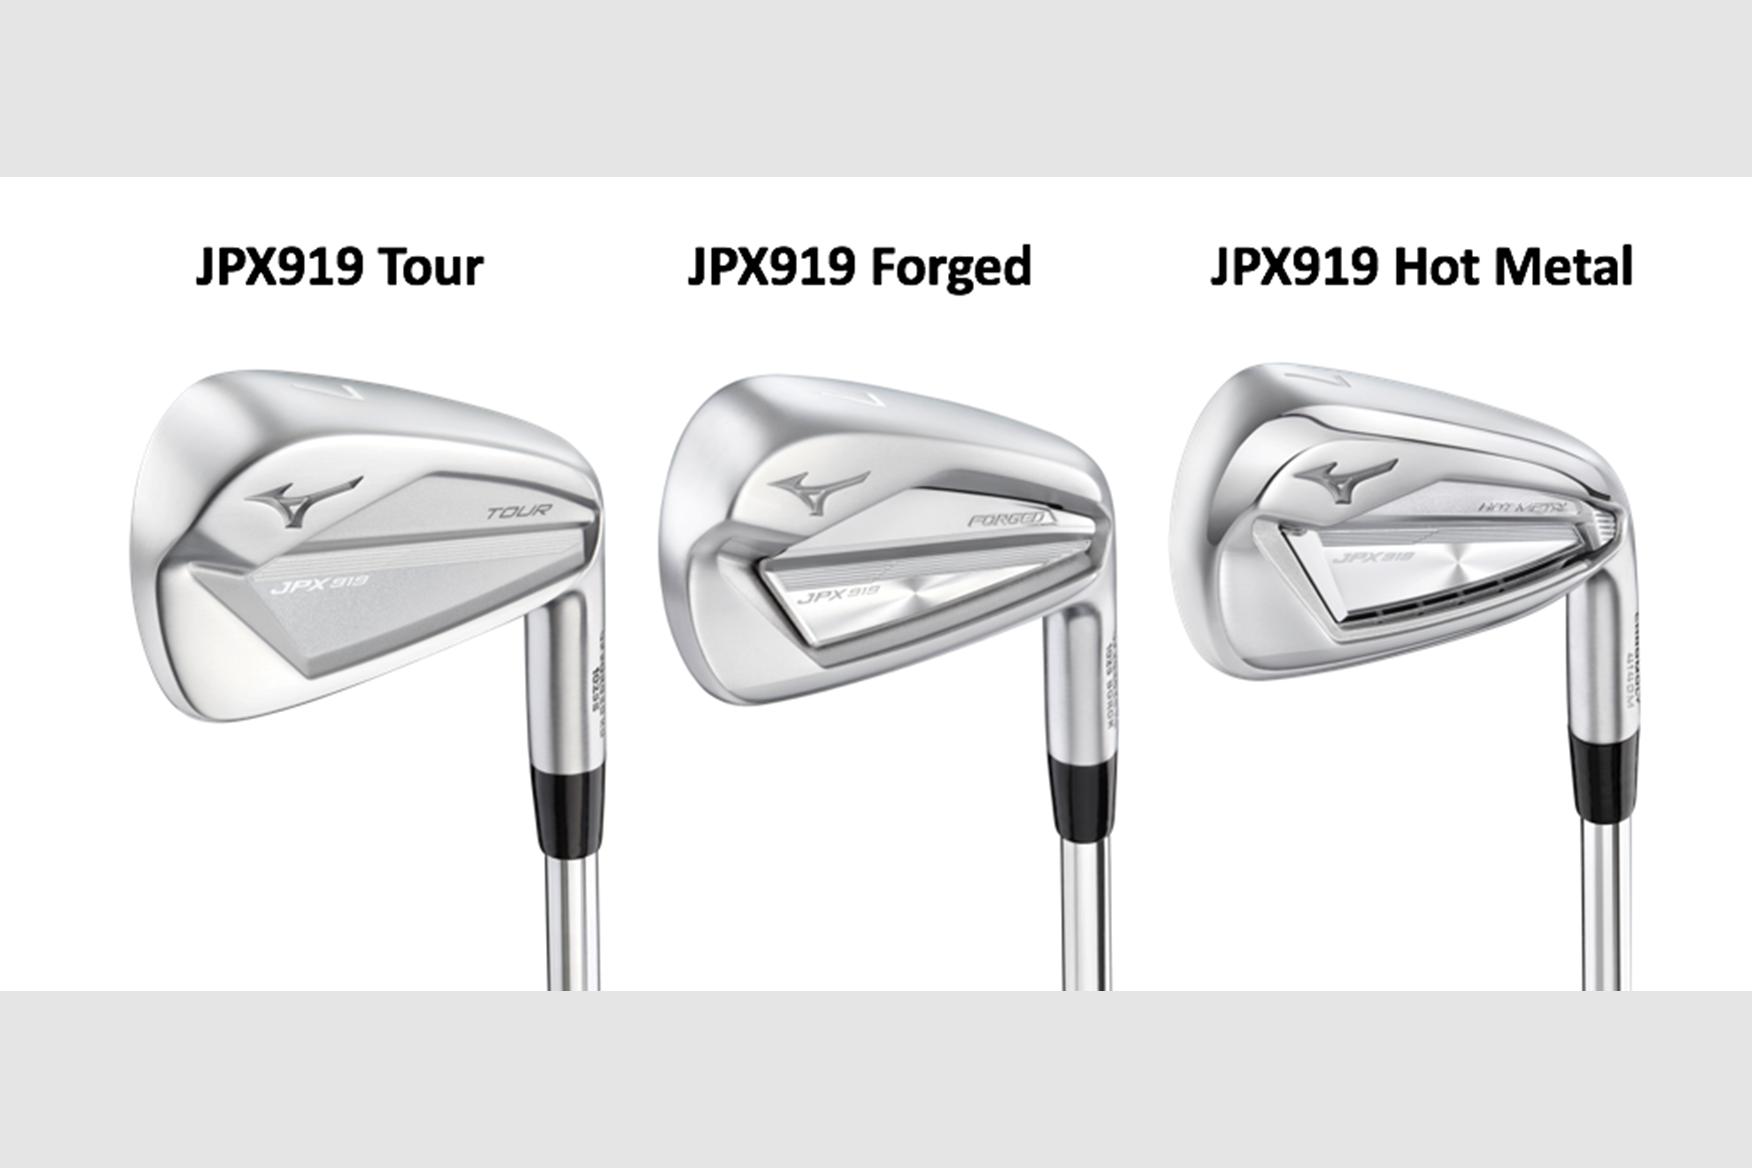 Mizuno Jpx919 Hot Metal Iron Review Equipment Reviews Today S Golfer